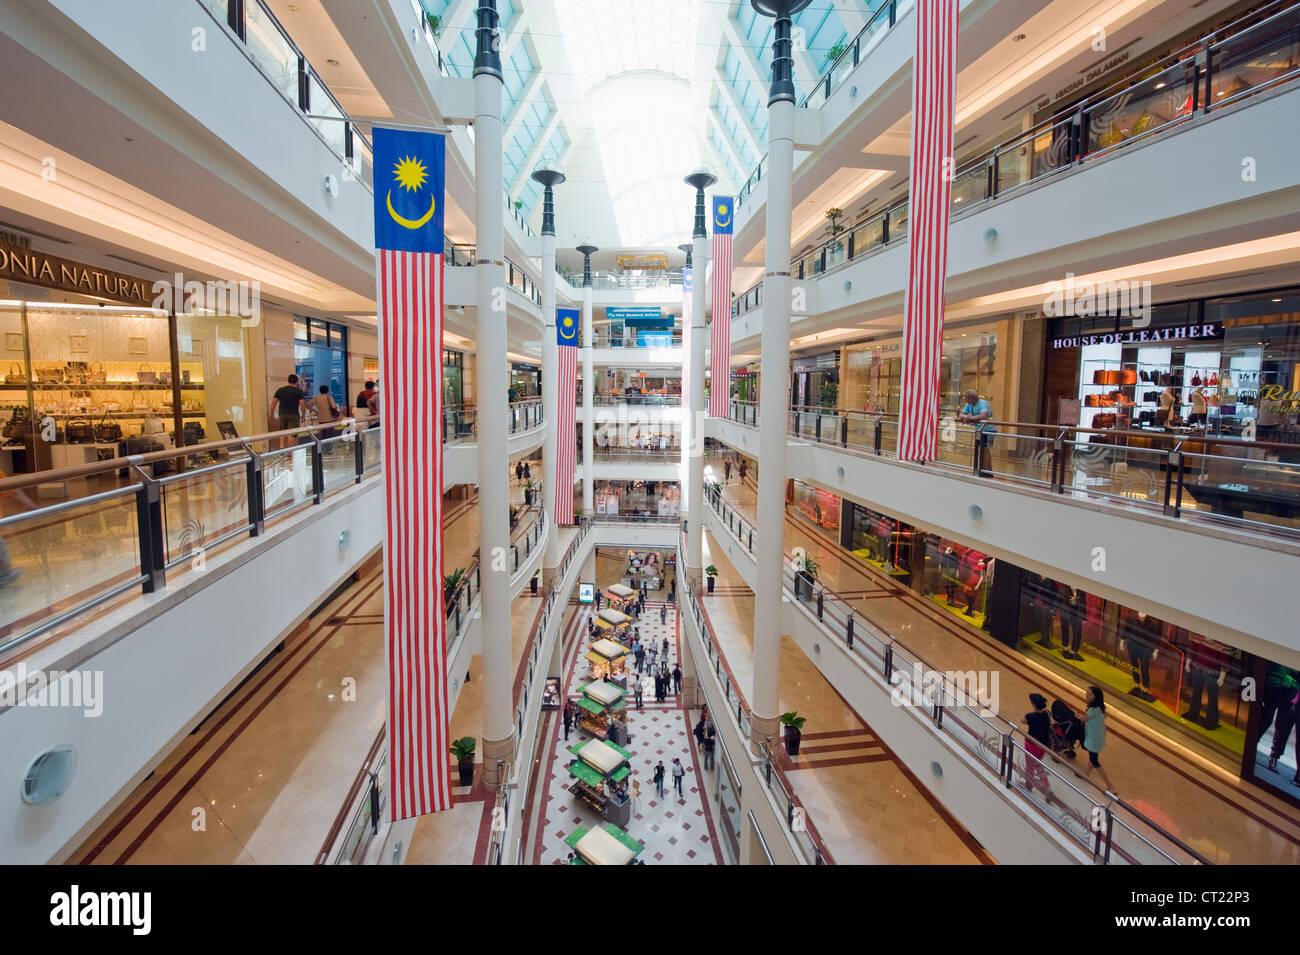 Suria KLCC shopping mall inside Petronas Towers, Kuala Lumpur, Malaysia, South East Asia - Stock Image